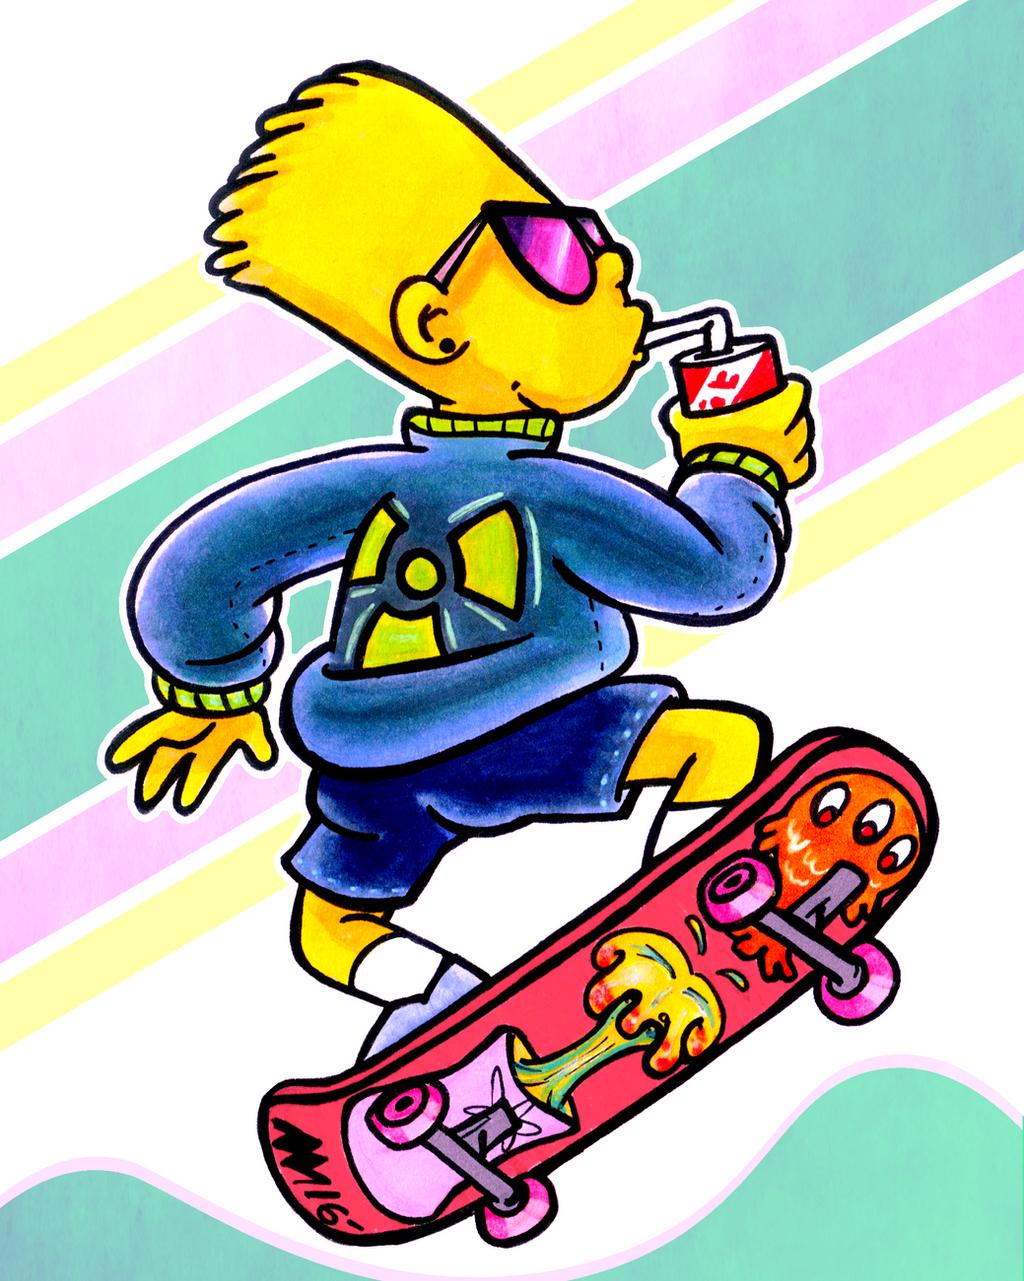 Cool Nuclear Bart by anniemae04 on DeviantArt